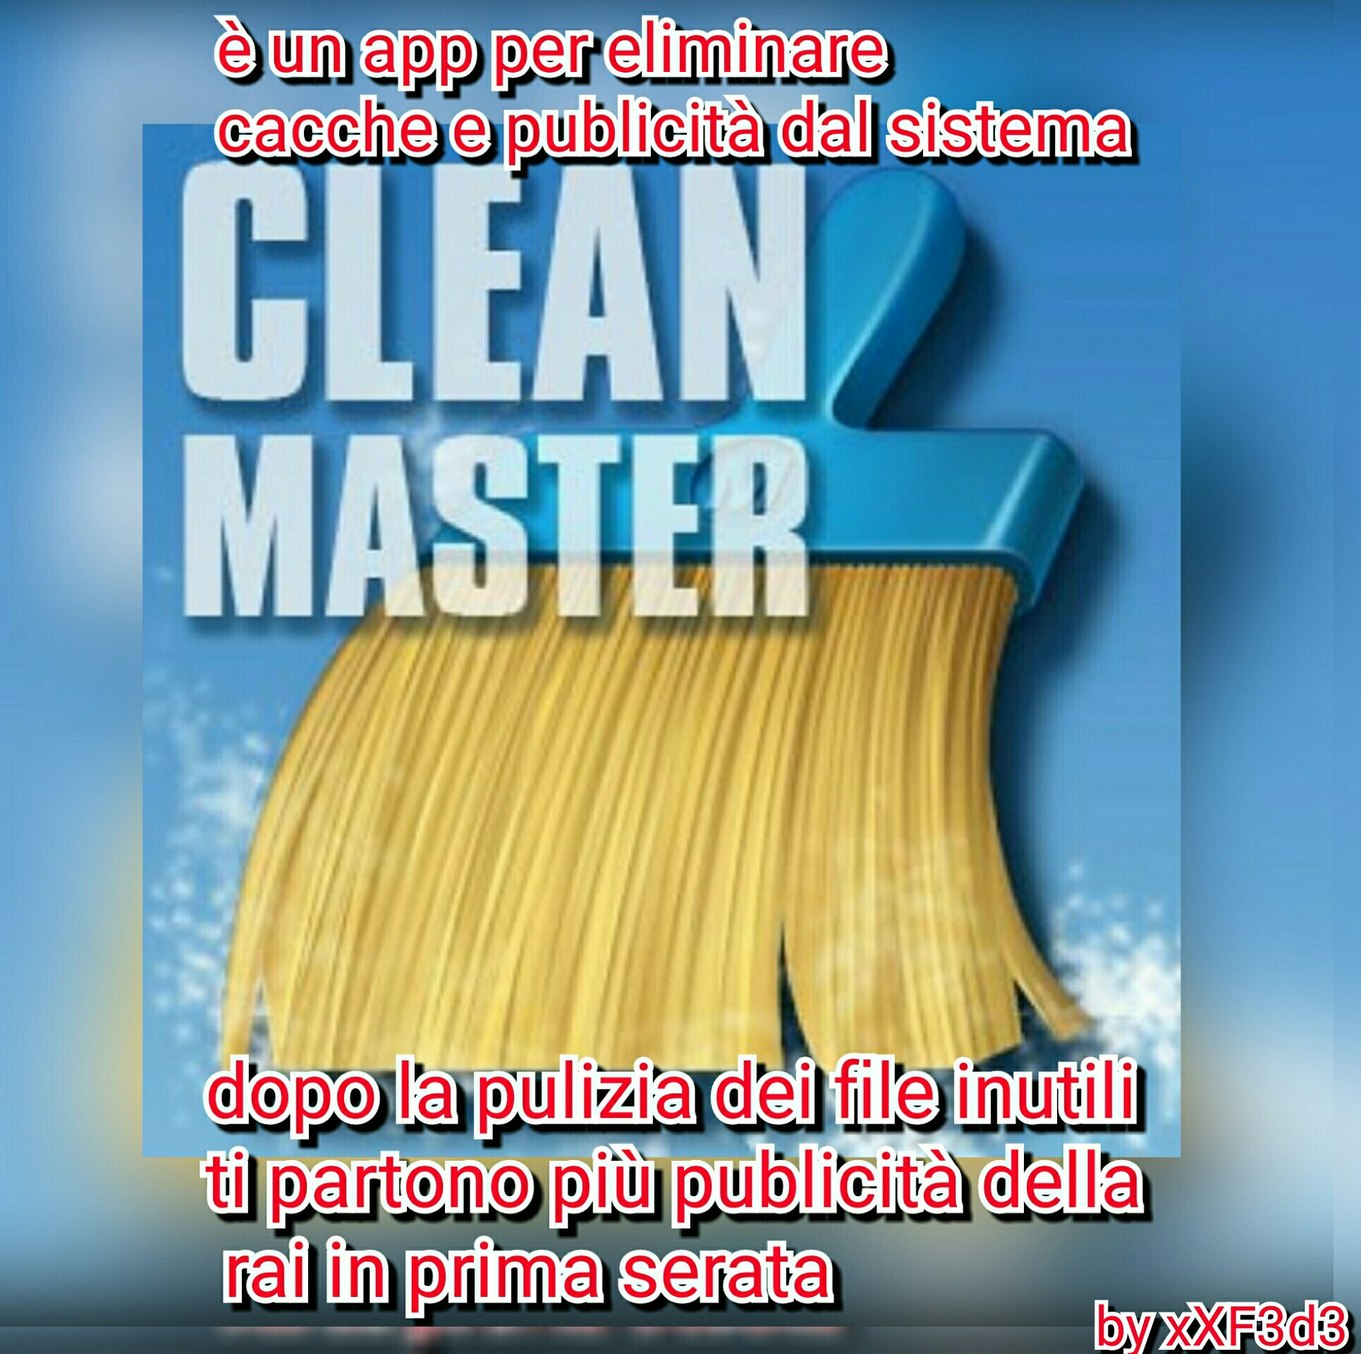 """Clean Master"" cito chi si sta masturbando!1!1!1 XD p.s. tt mmdroi - meme"